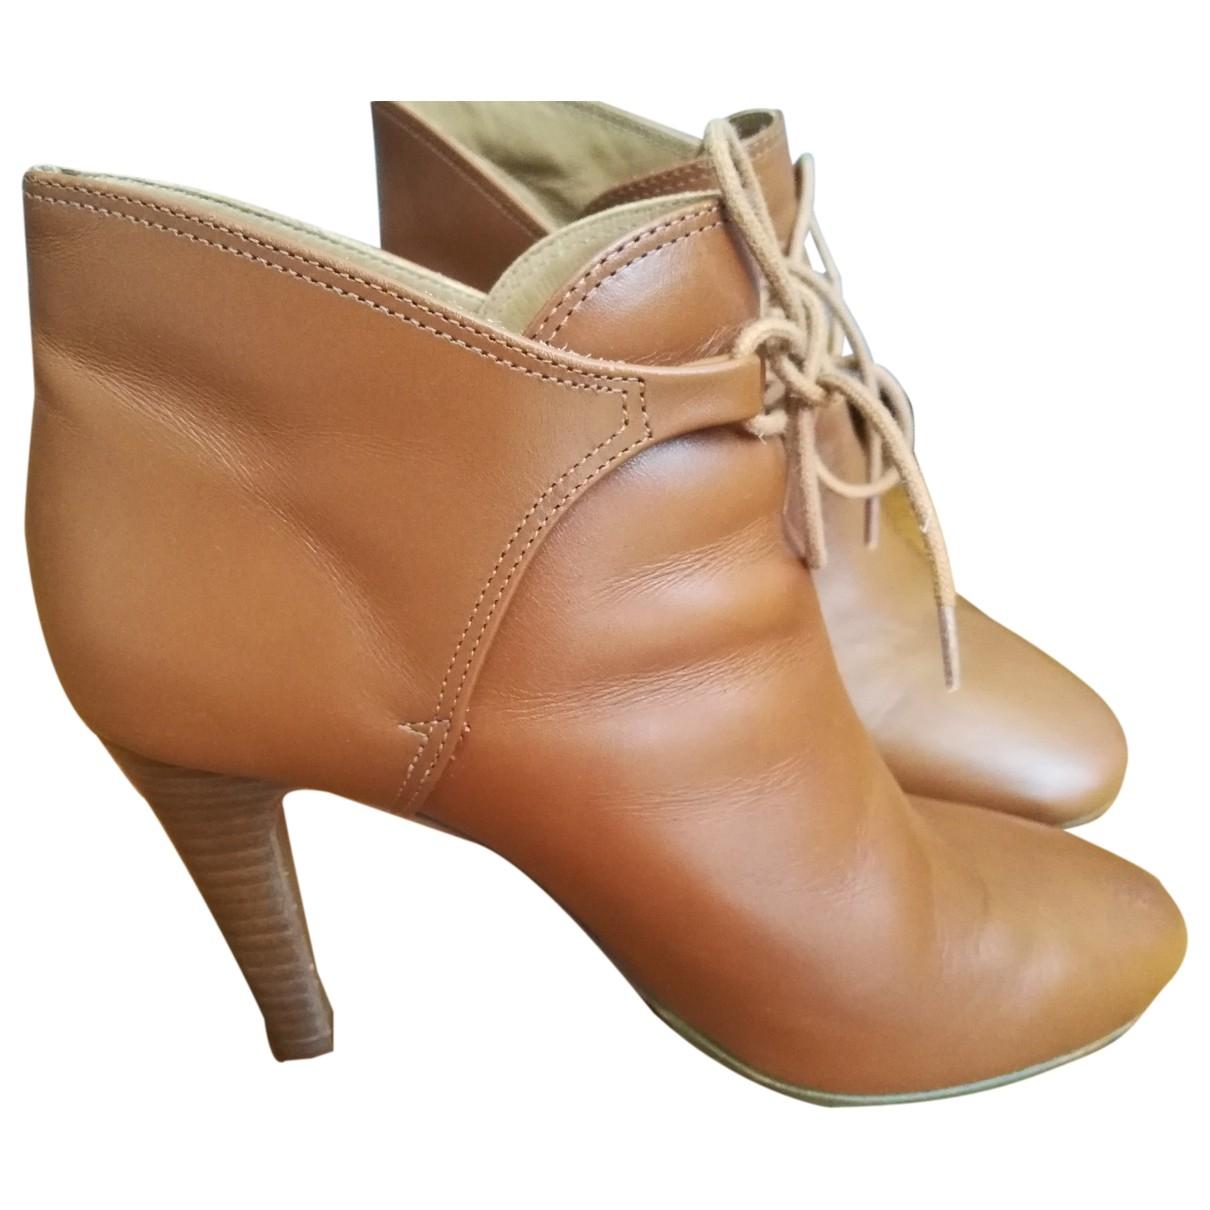 Sézane \N Camel Leather Ankle boots for Women 37 EU